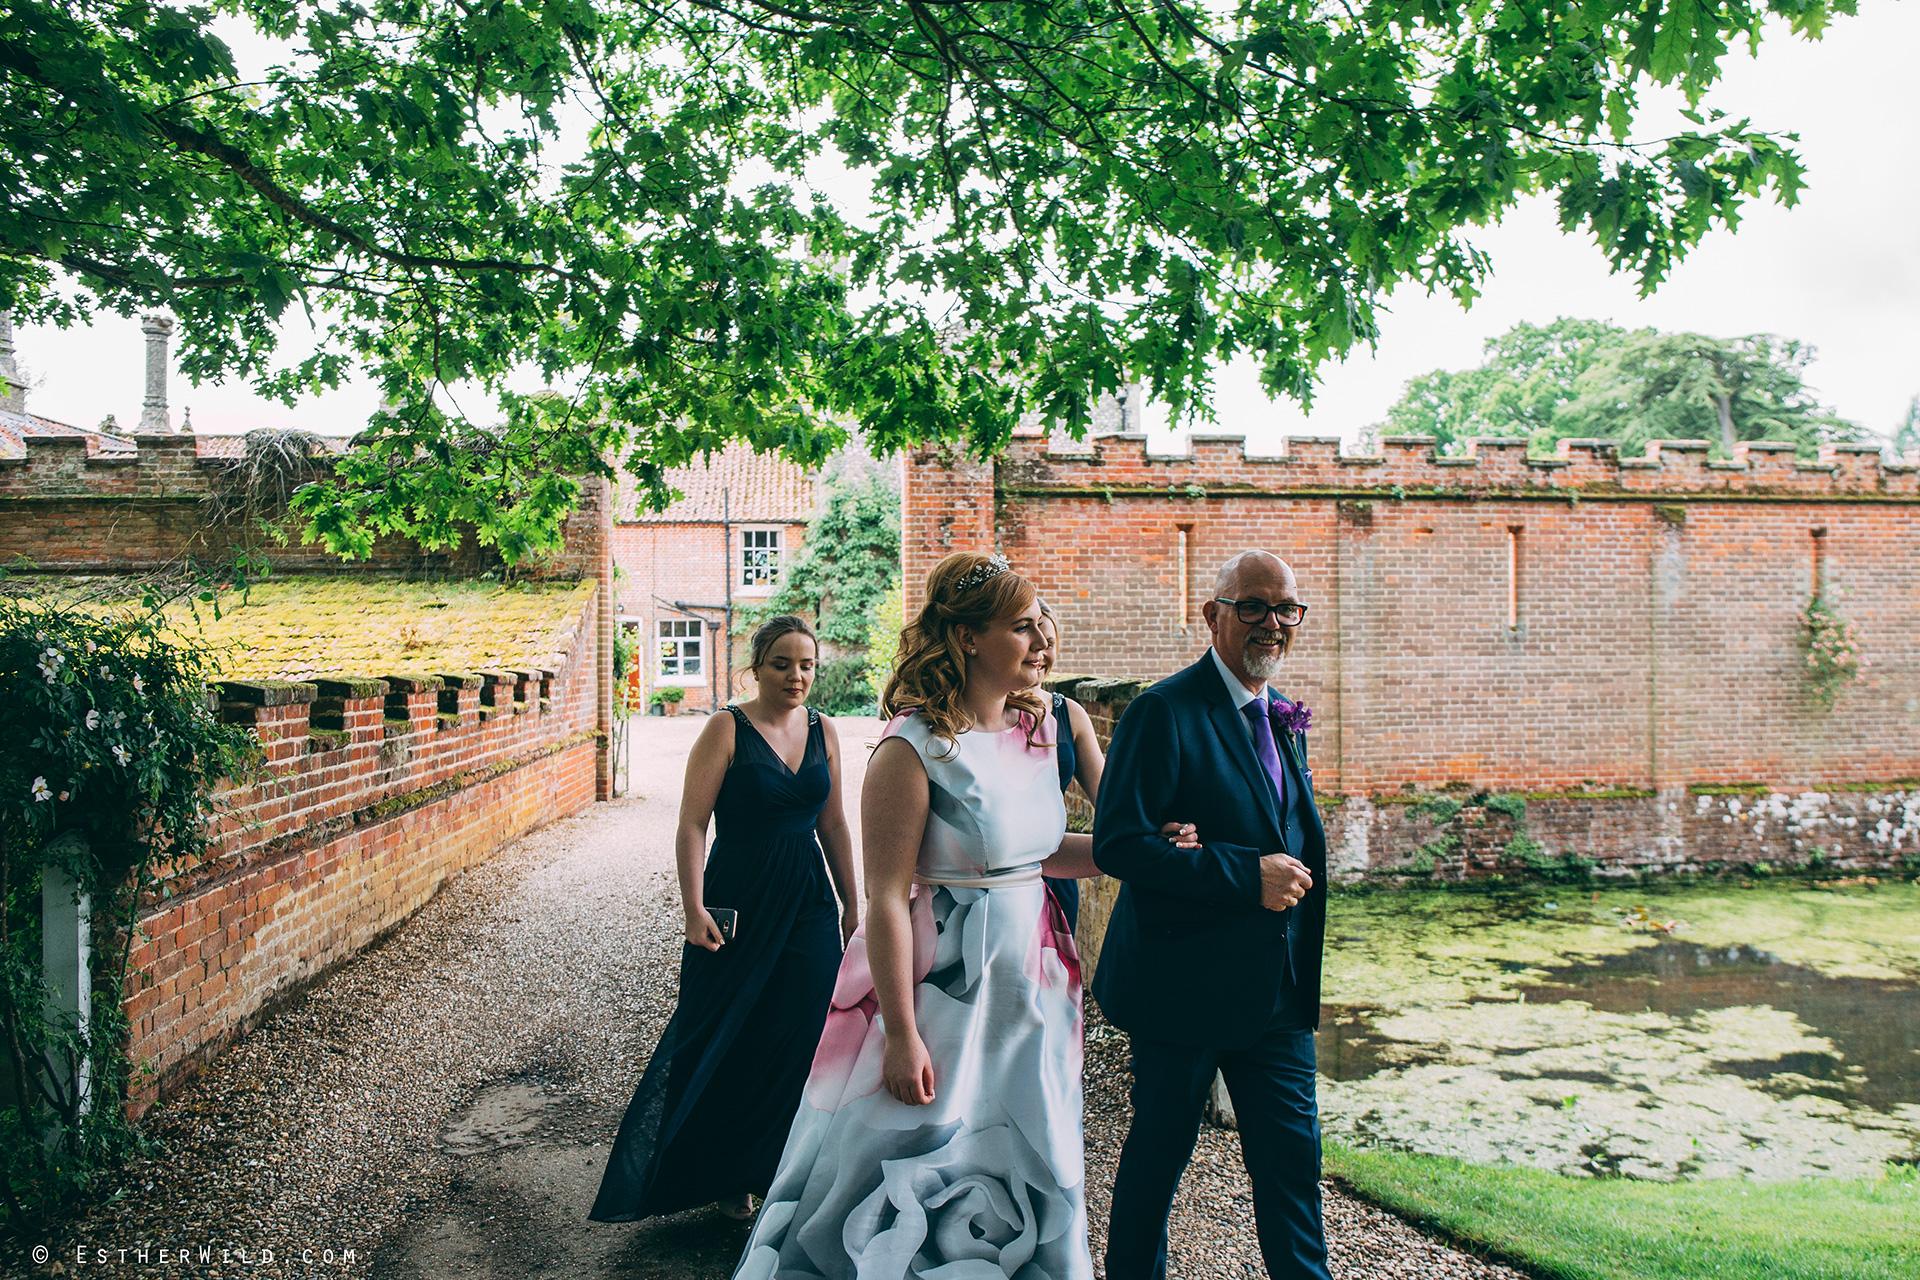 Norfolk_Wedding_Photographer_Mannington_Hall_Country_Esther_Wild_0009.jpg